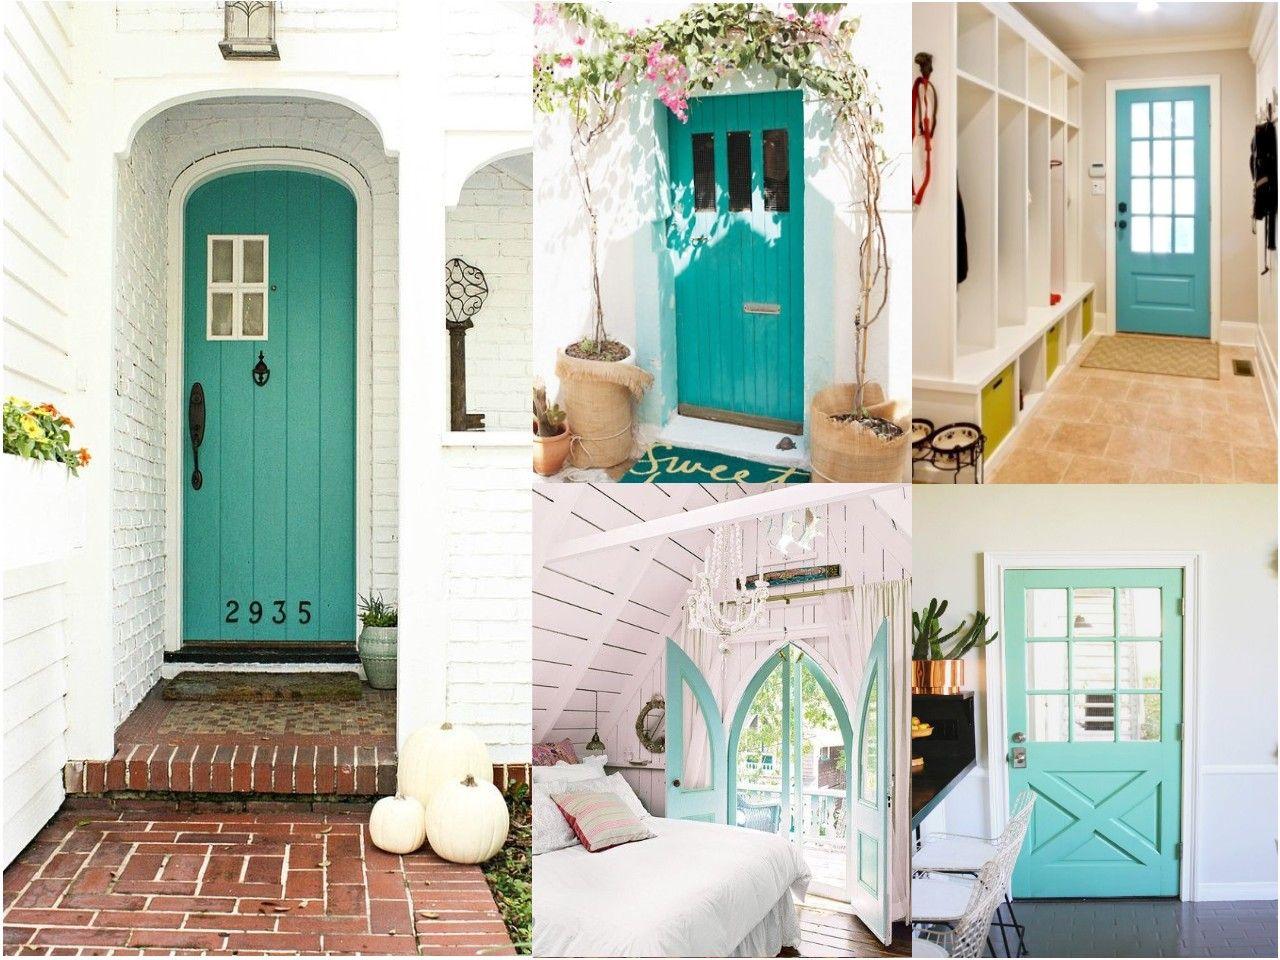 C mo pintar las puertas de casa ideas e inspiraci n - Como pintar una casa rustica ...